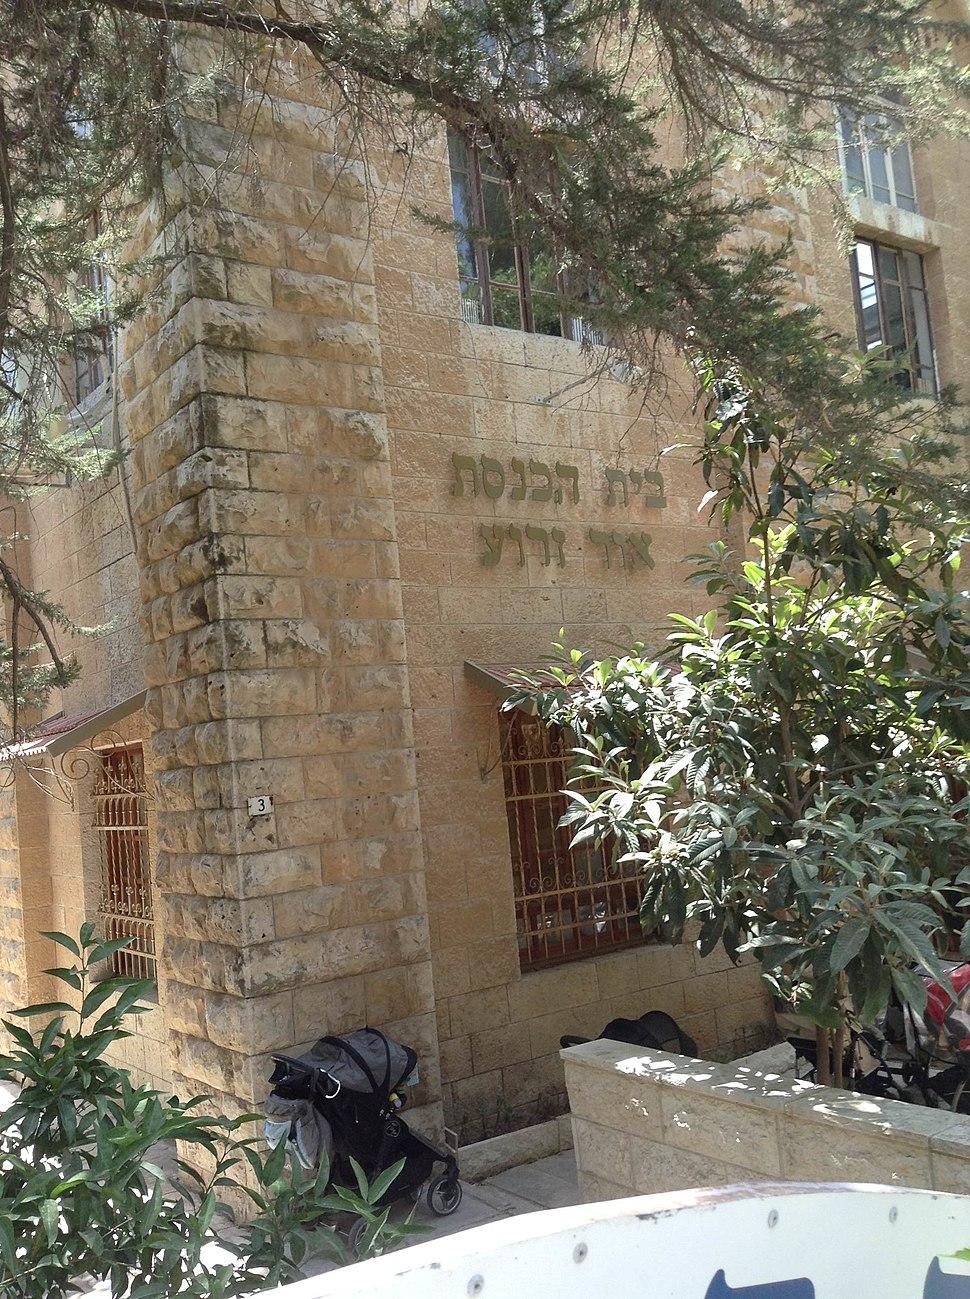 Or Zaruaa synagogue, founded by Rabbi Amram Aburbeh in Nahlat Ahim, Jerusalem, Israel exterior photo; showing location on 3 Refali street.